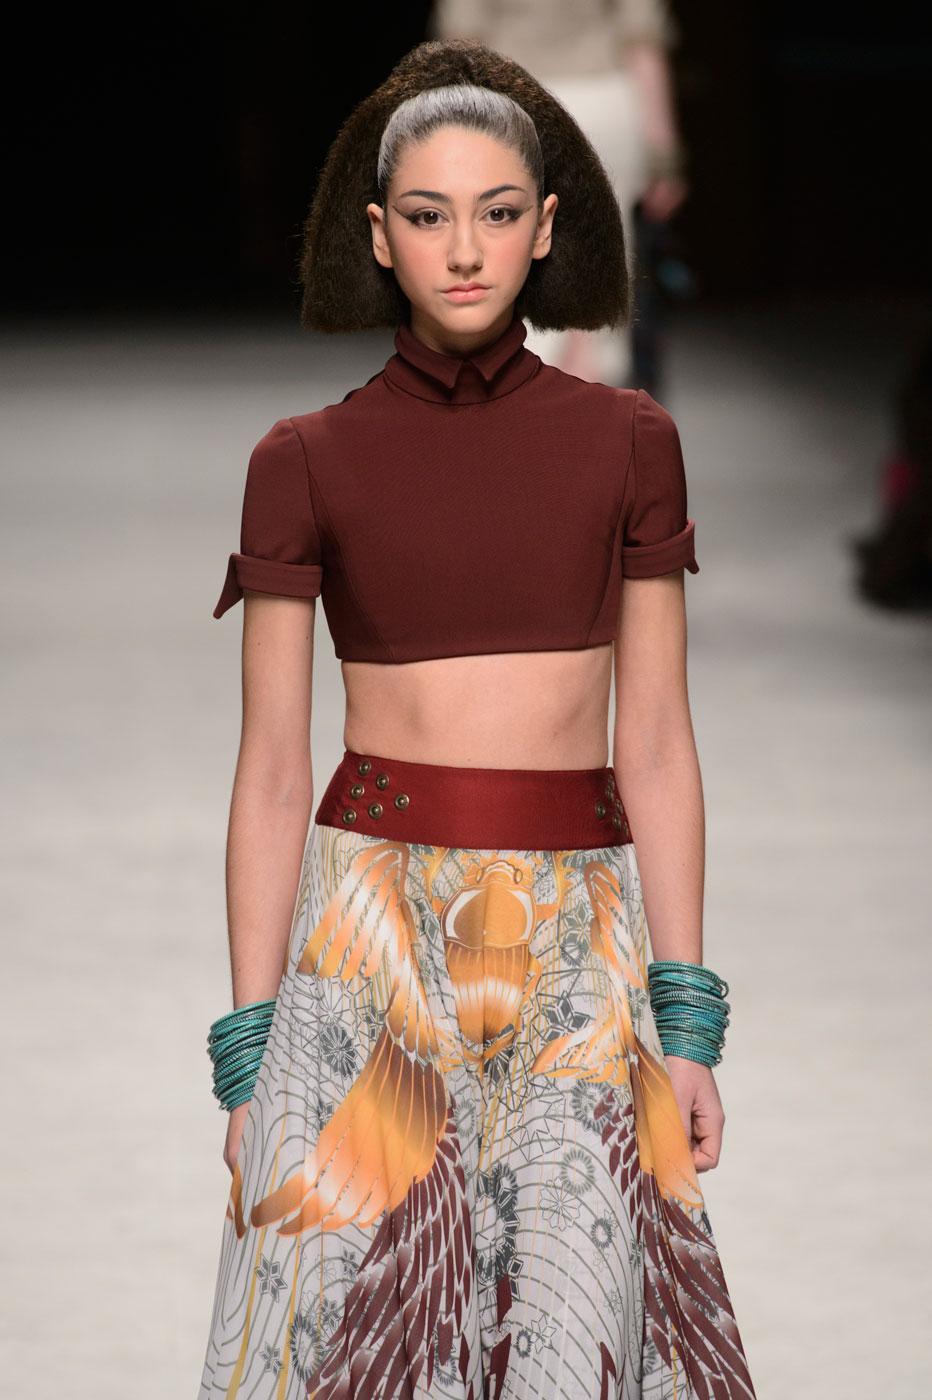 Julien-Fournie-Prive-fashion-runway-show-haute-couture-paris-spring-2015-the-impression-17